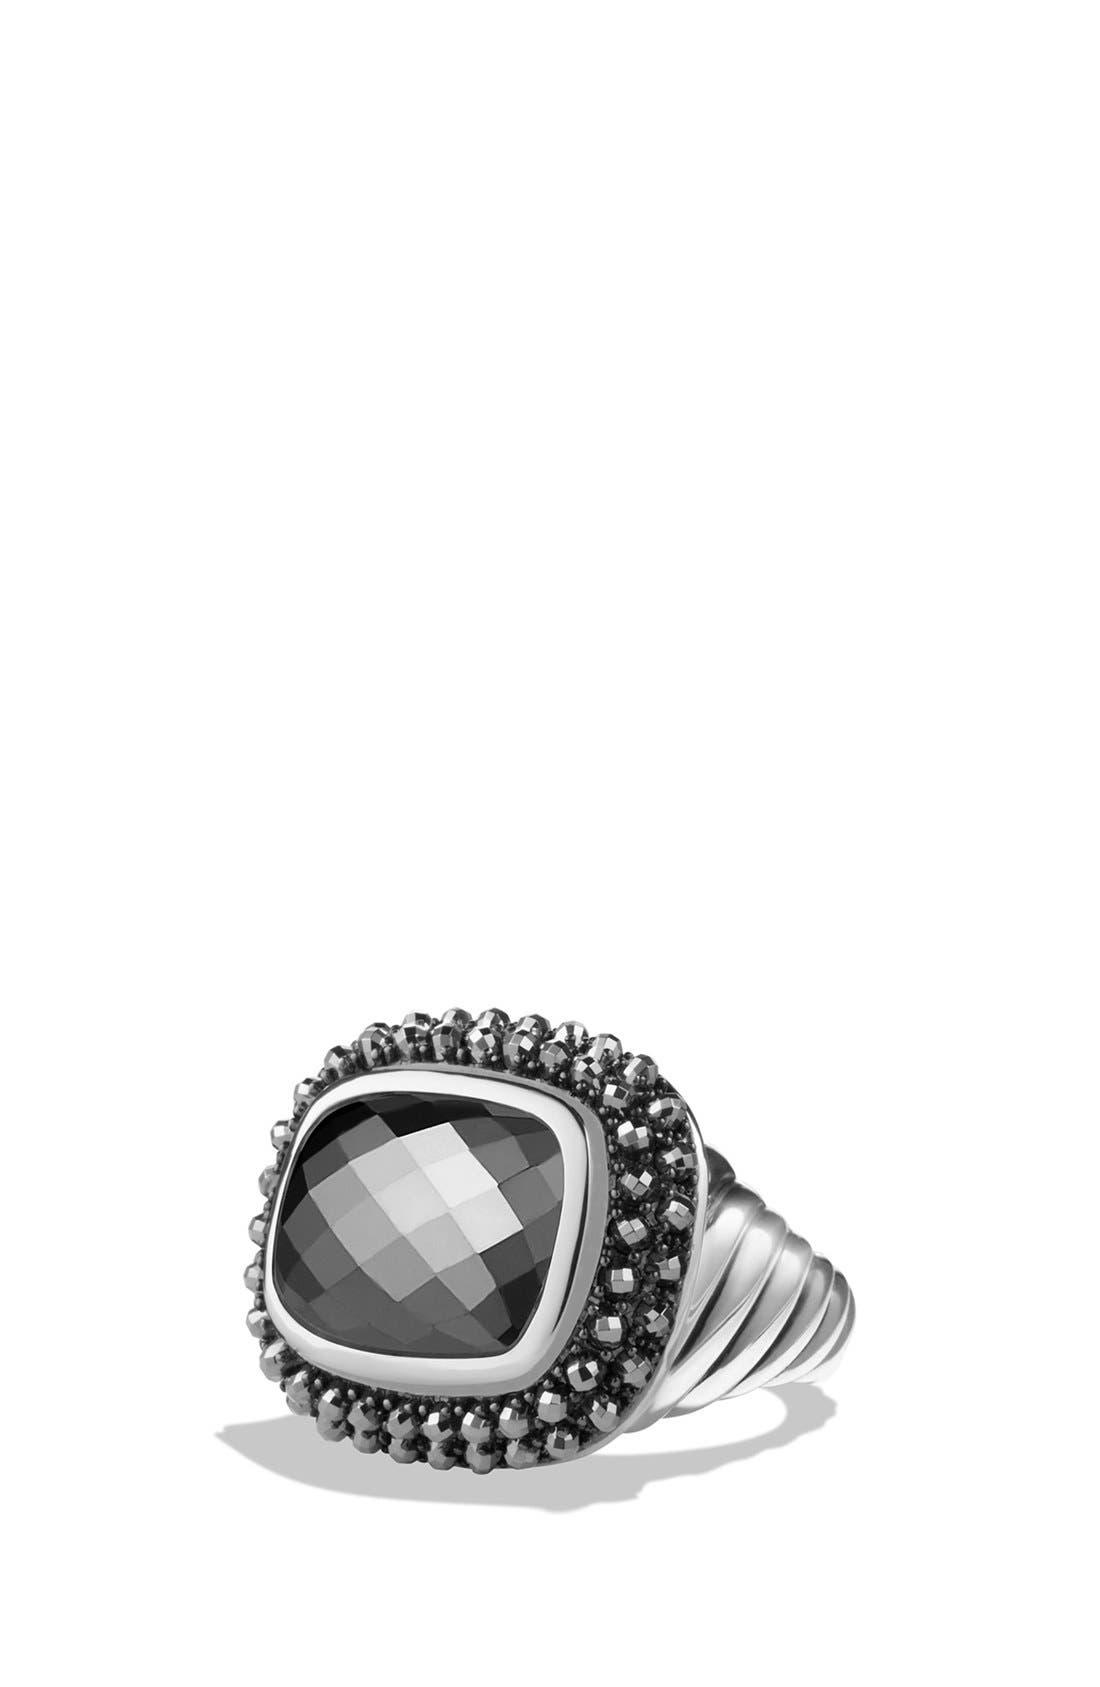 DAVID YURMAN 'Osetra' Ring with Semiprecious Stone